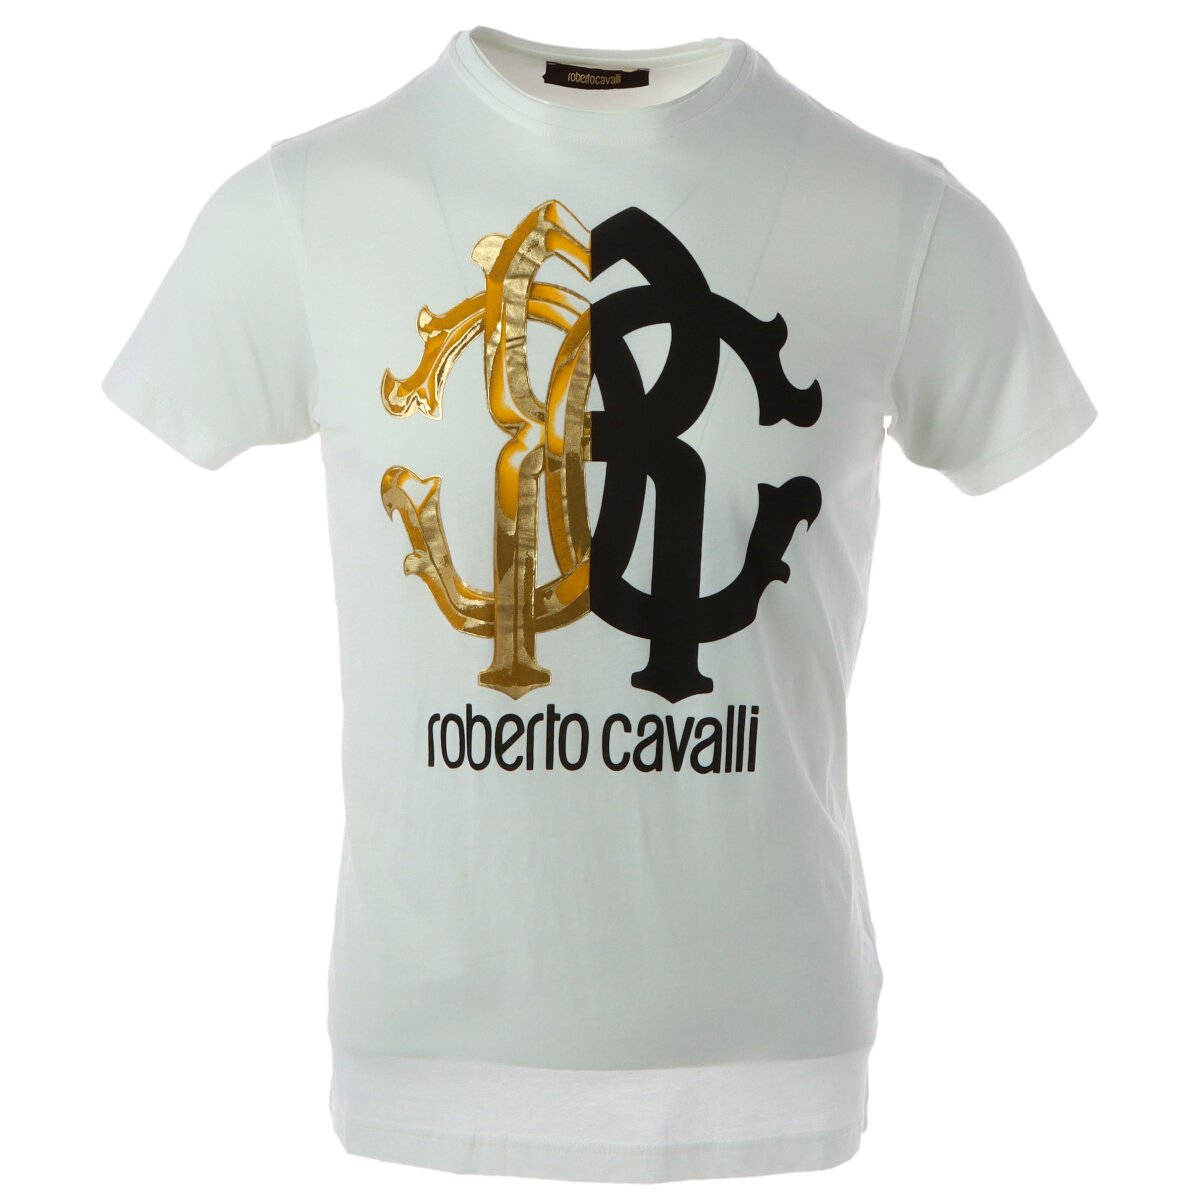 Roberto Cavalli - Roberto Cavalli Men T-Shirt - white M